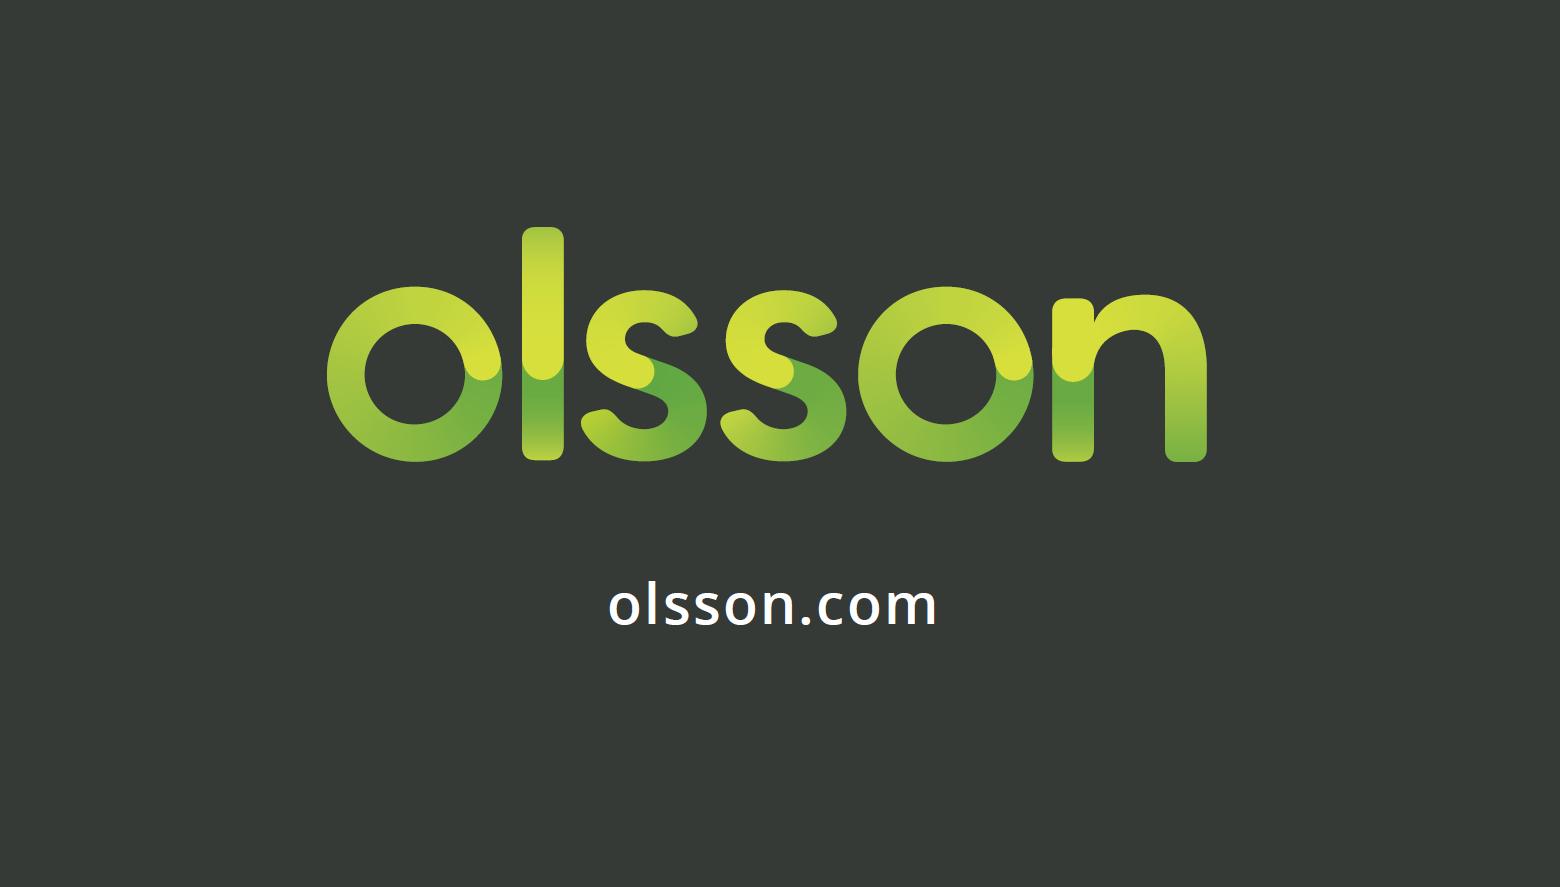 Olsson_2019